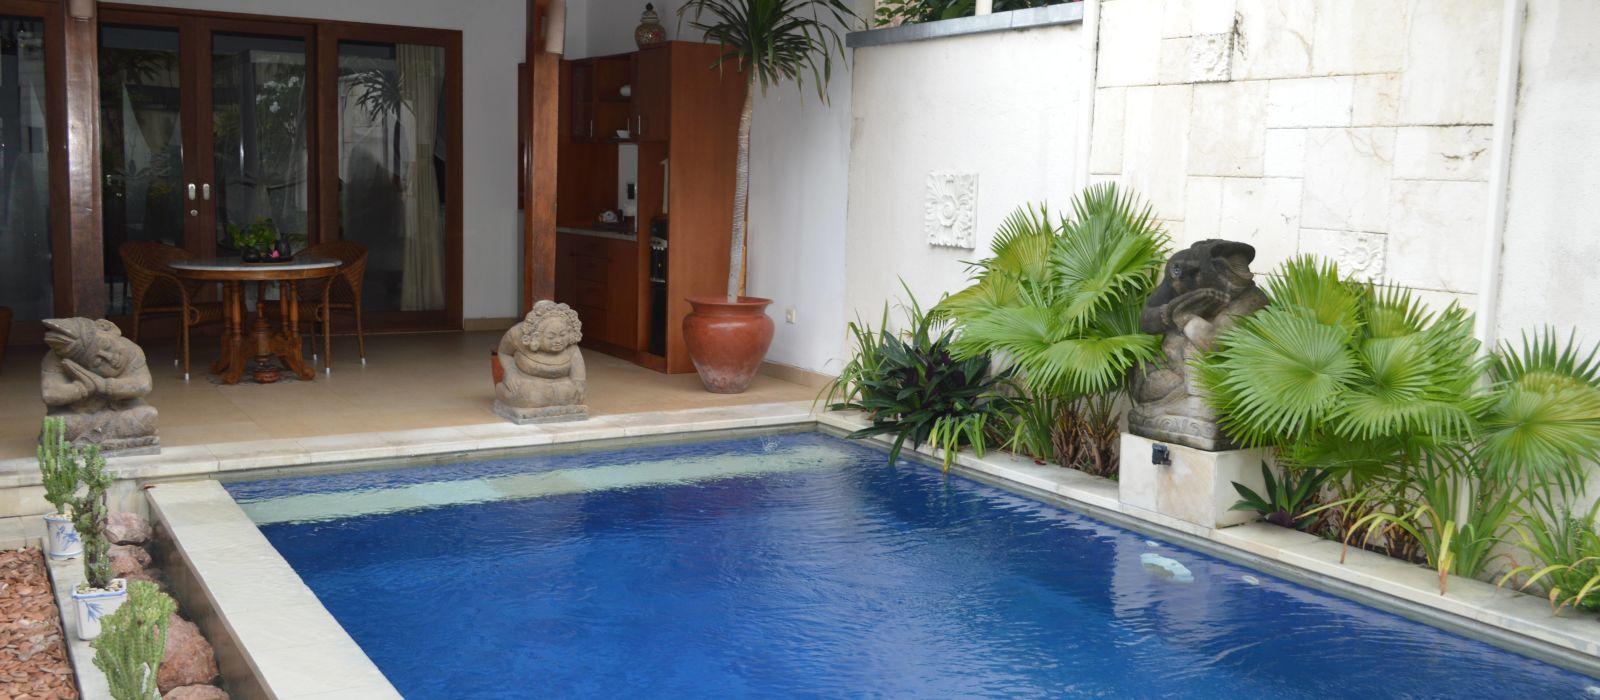 Hotel Puri Mas Boutique Resort & Spa Indonesia